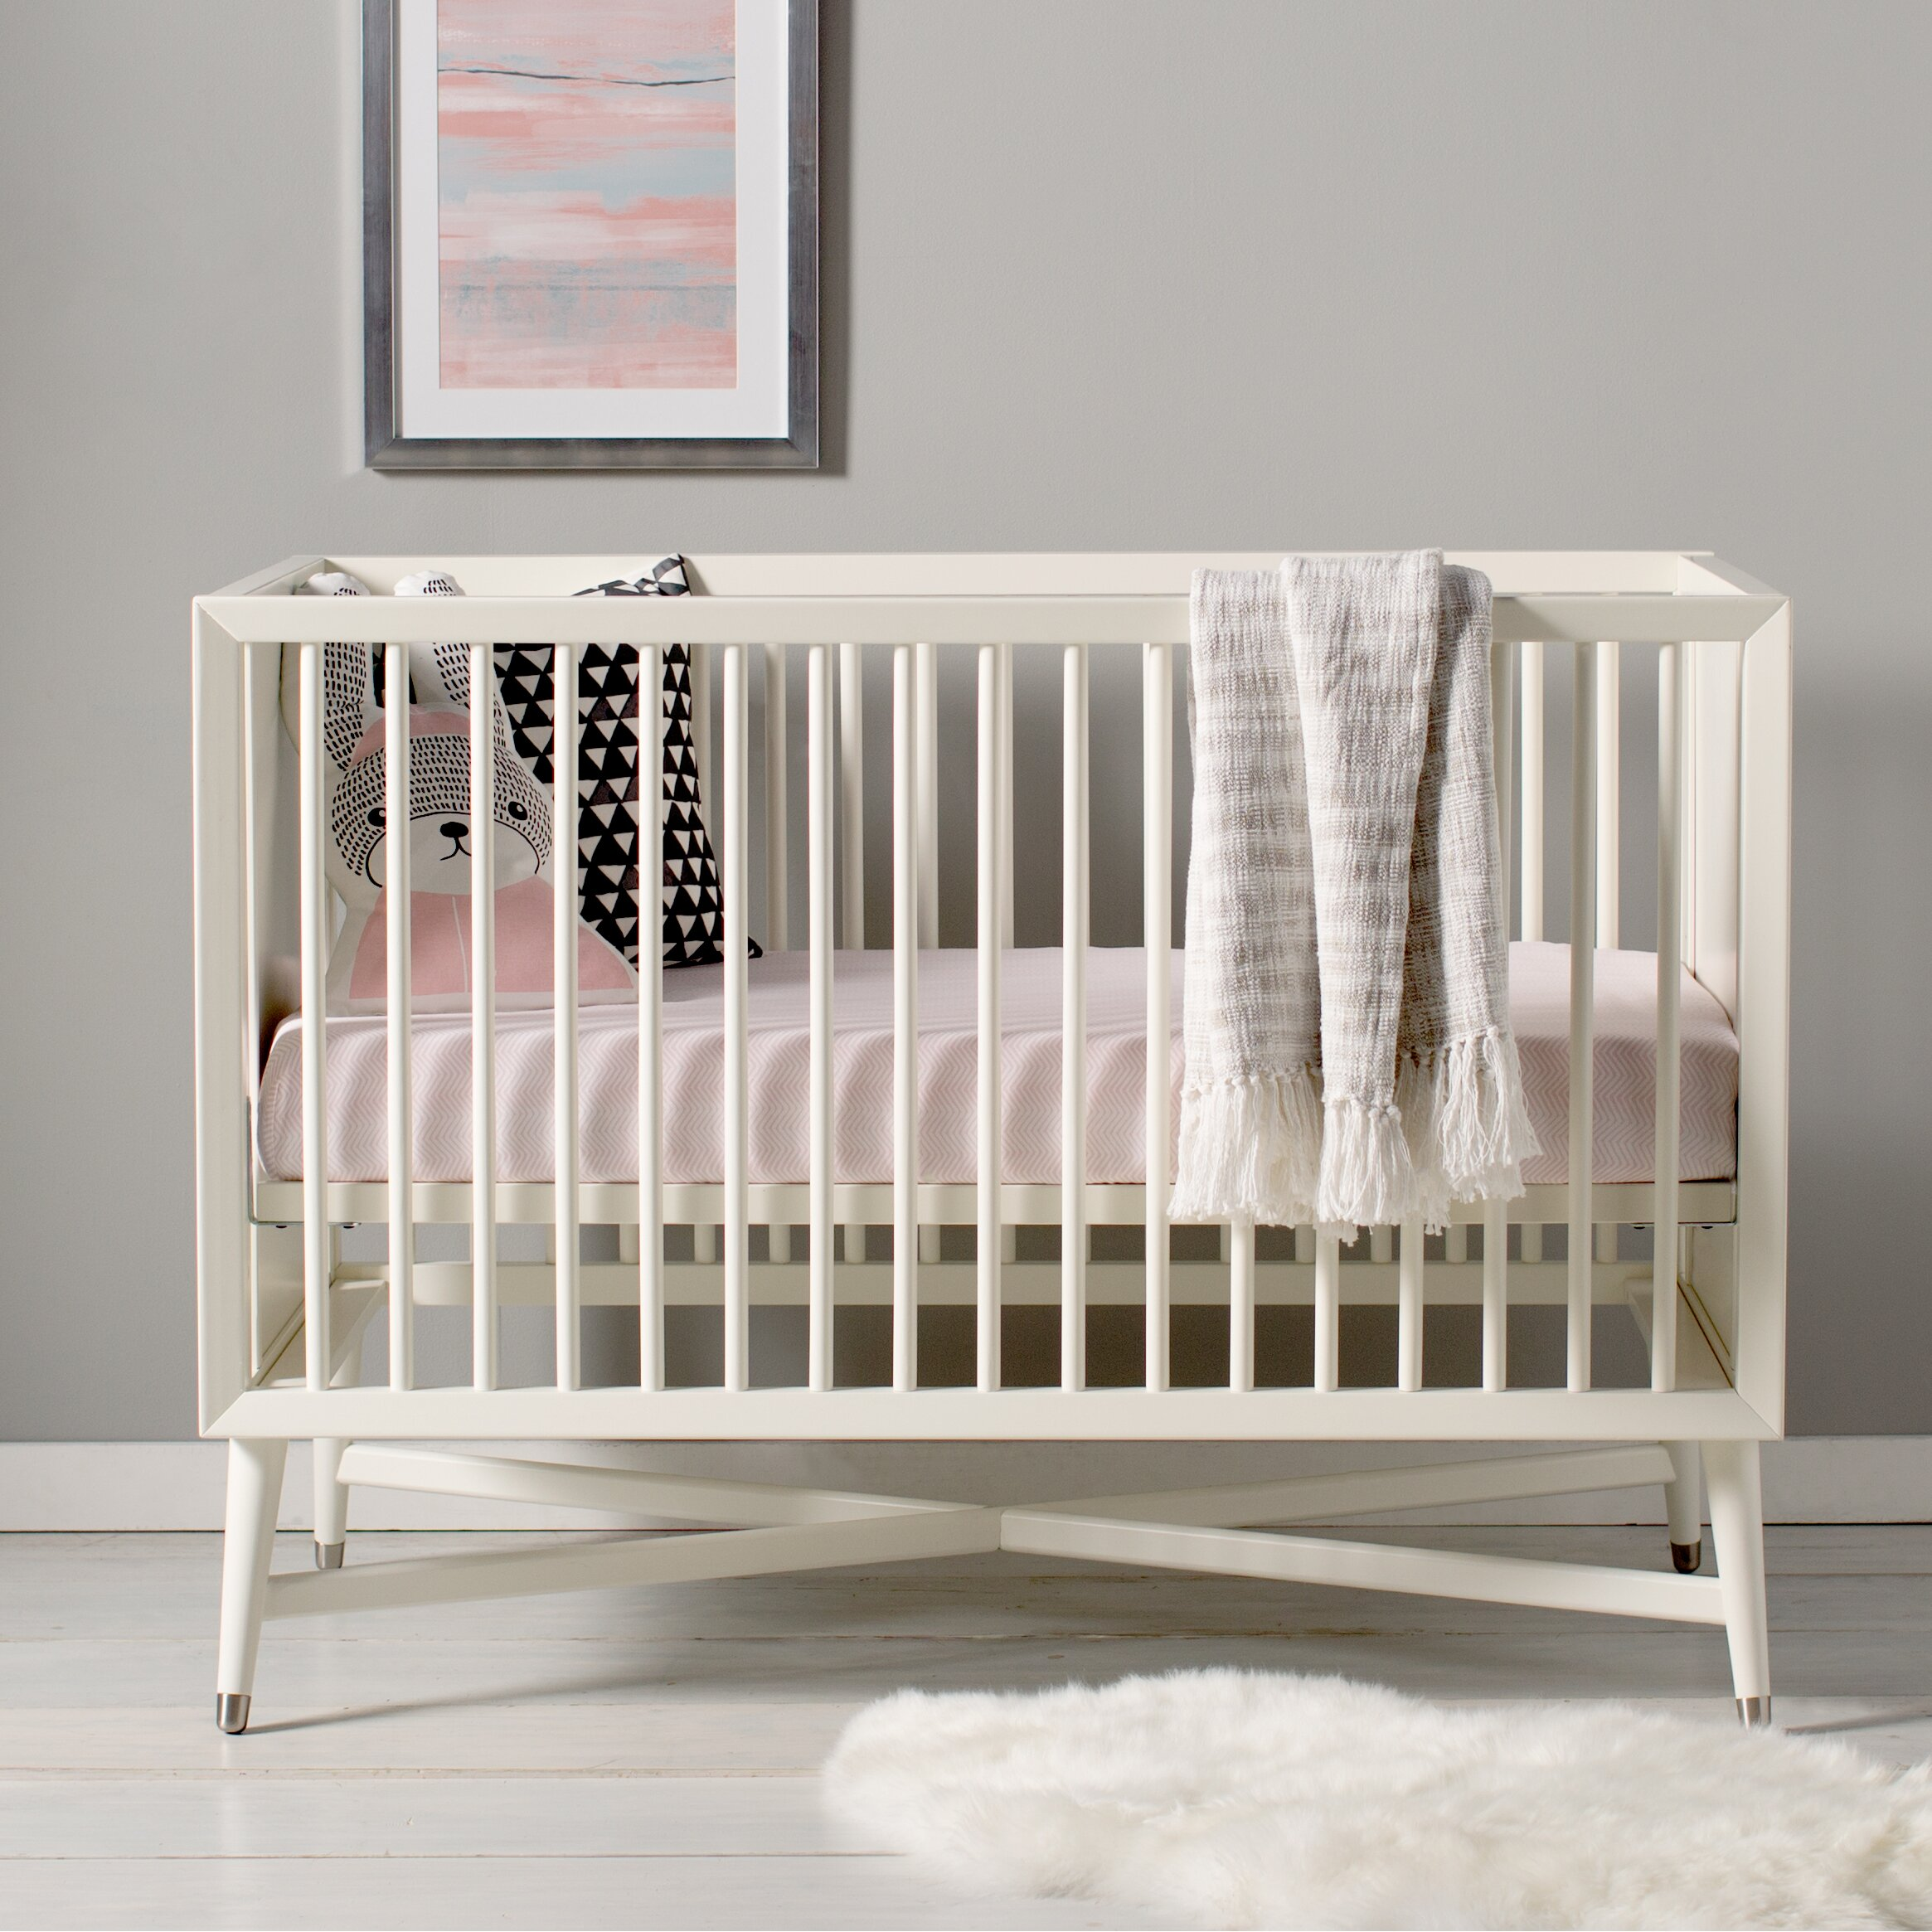 Crib hardware for sale - Dwellstudio Mid Century 3 In 1 Convertible Crib